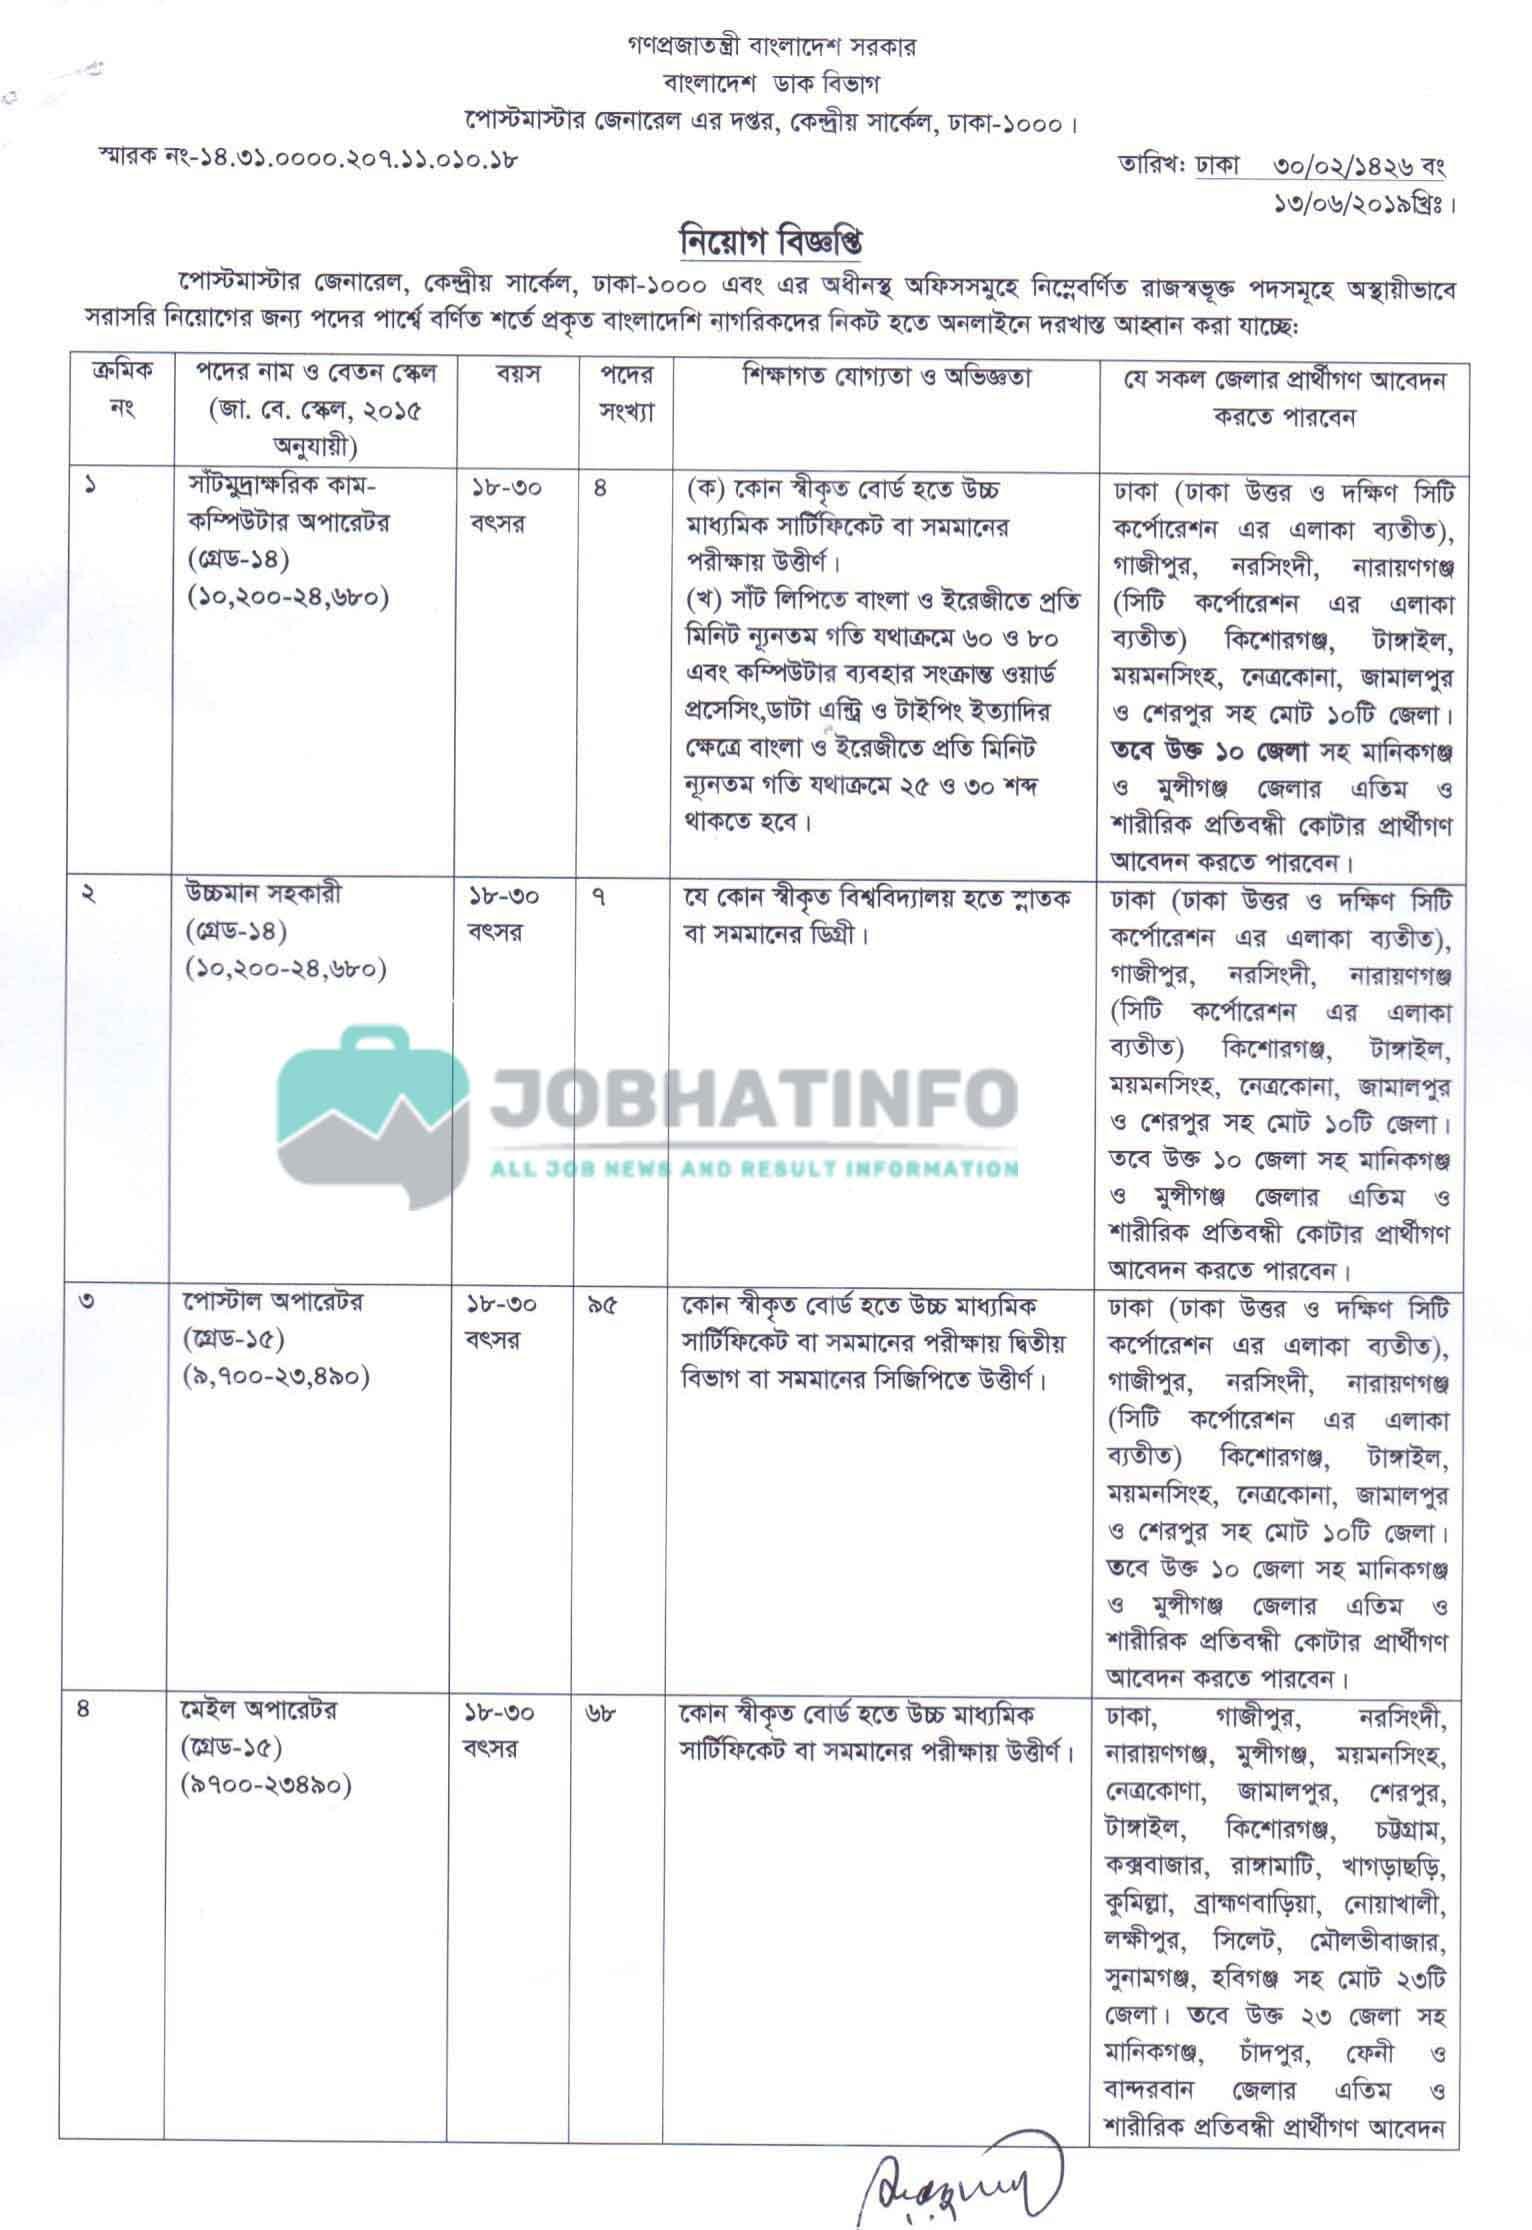 PMGCC job circular 2020   Postmaster General Central Circle   Govt Job Circular 2